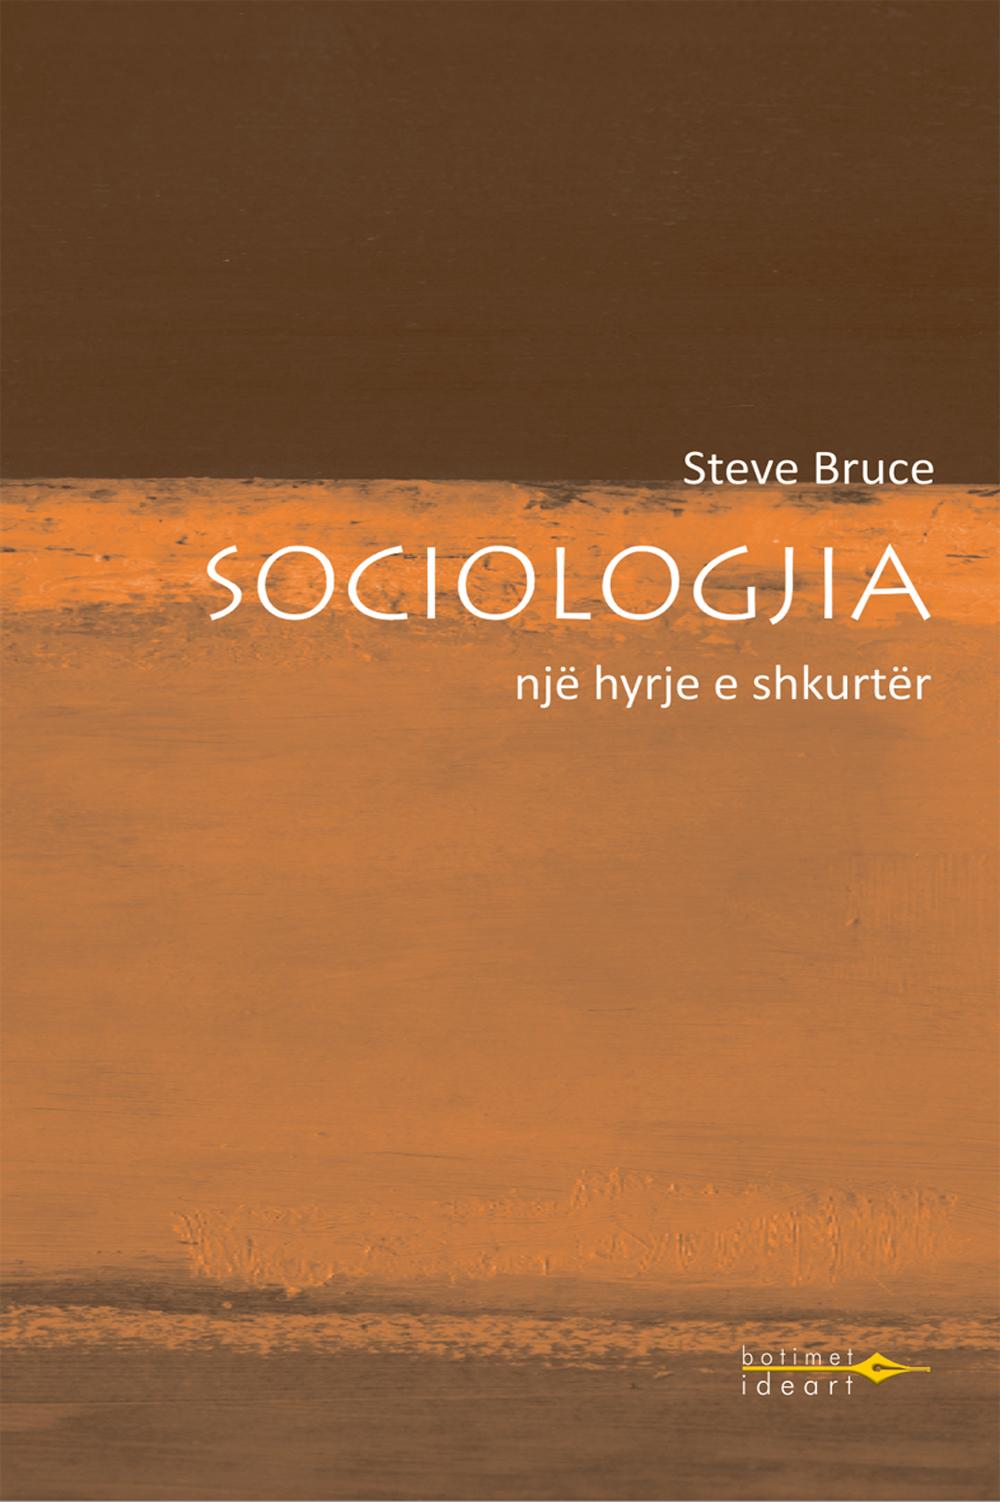 Sociologjia